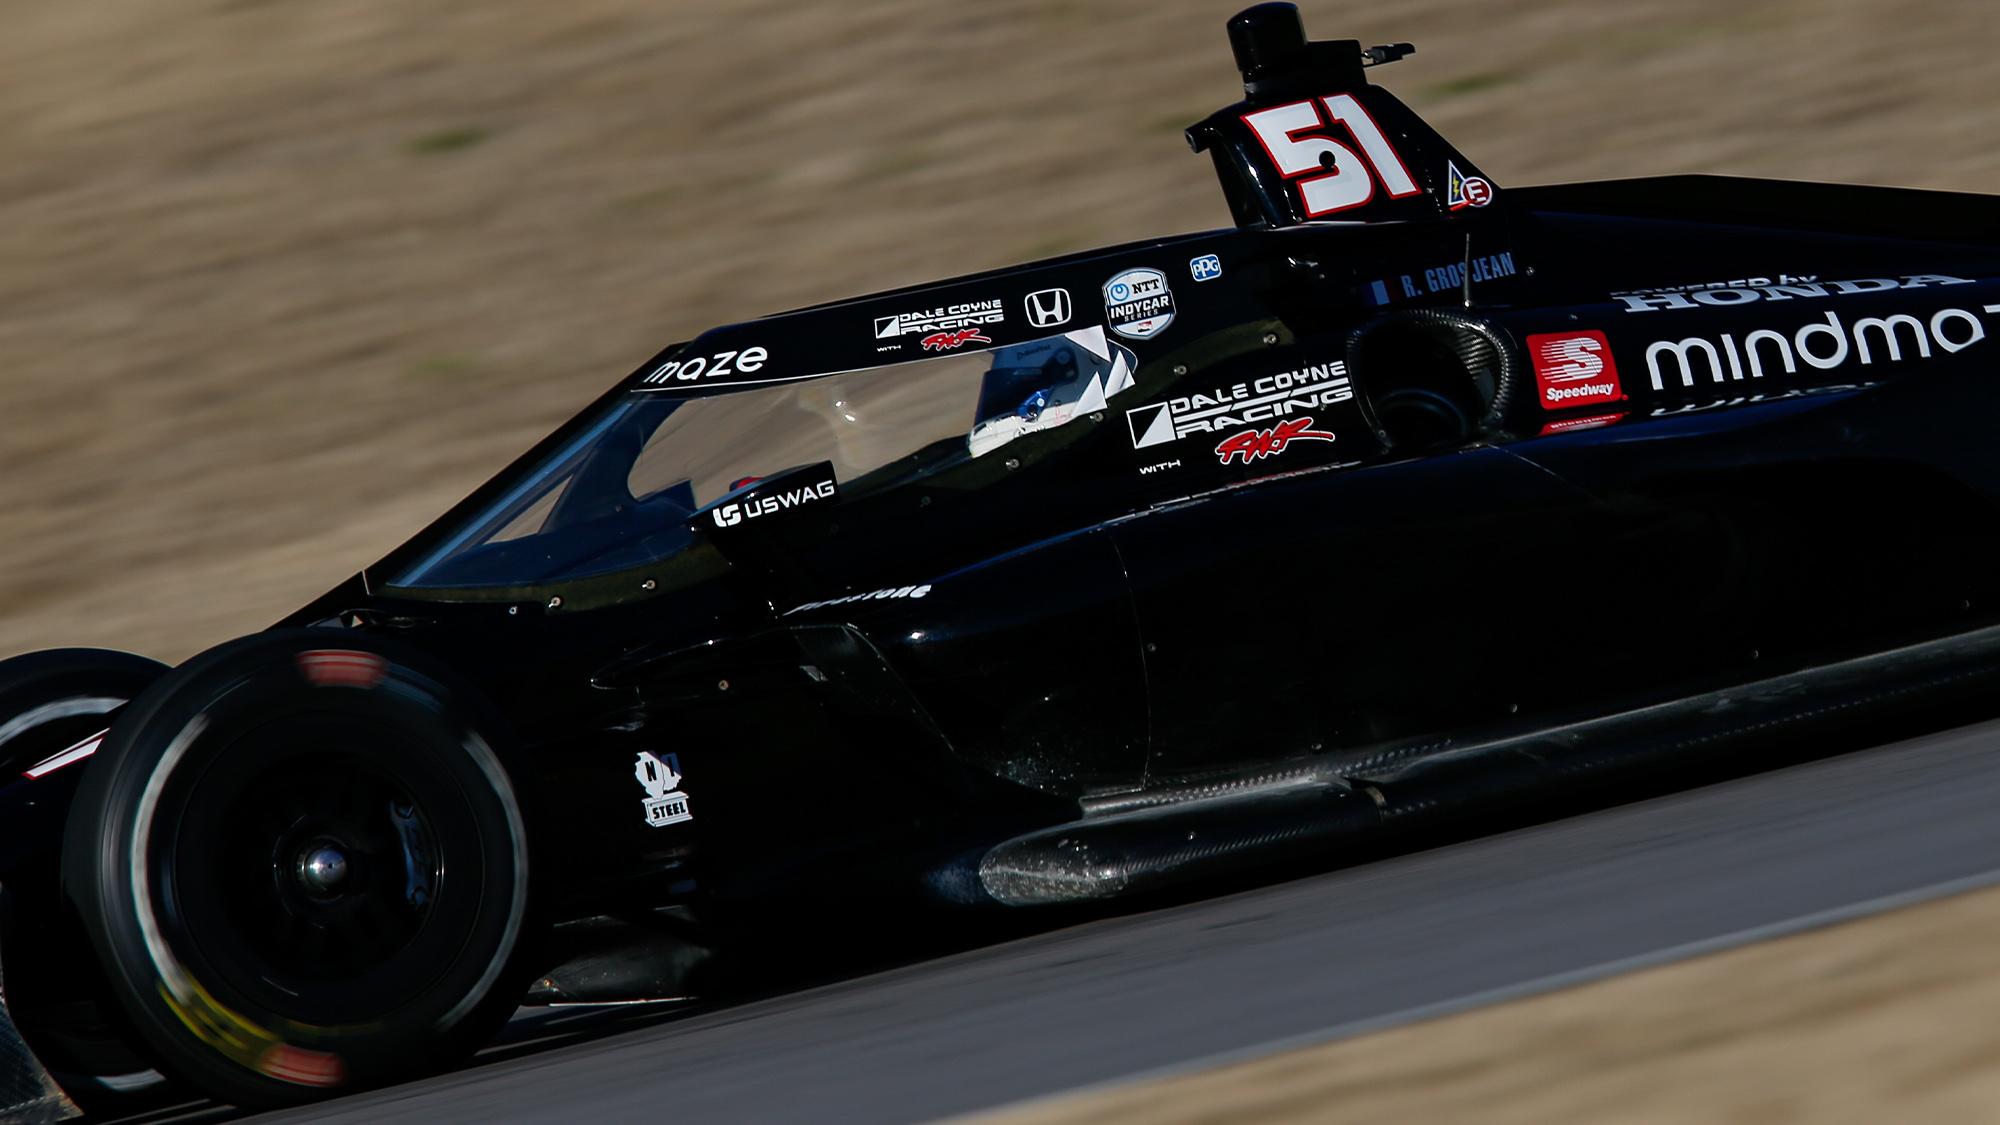 Romain Grosjean on track during his 2021 Indycar test